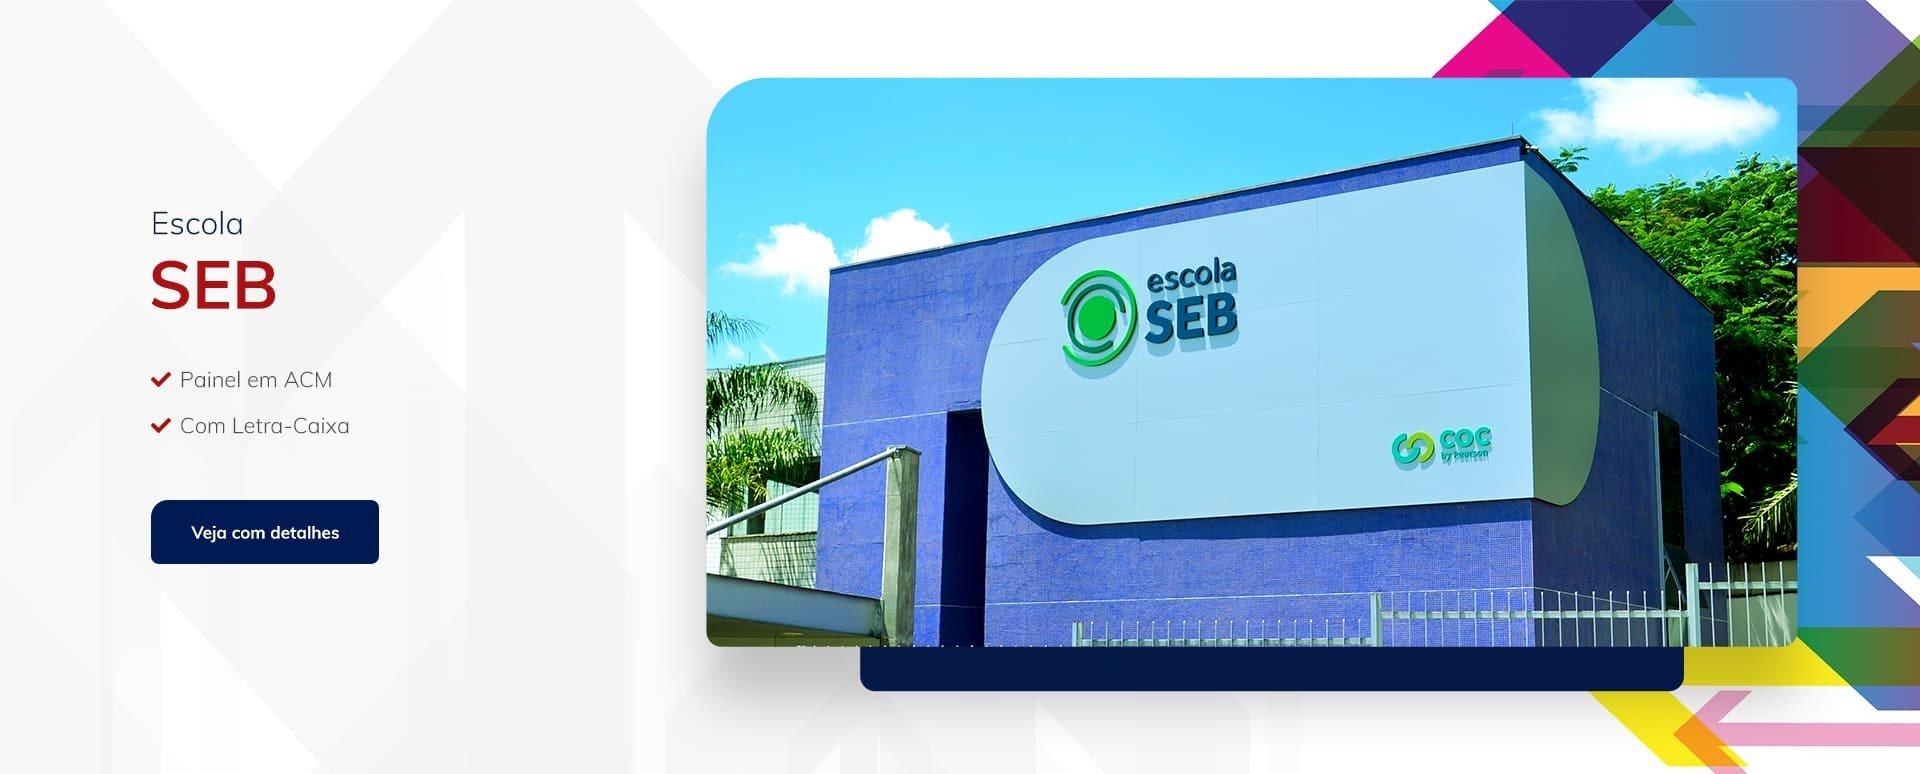 Escola SEB